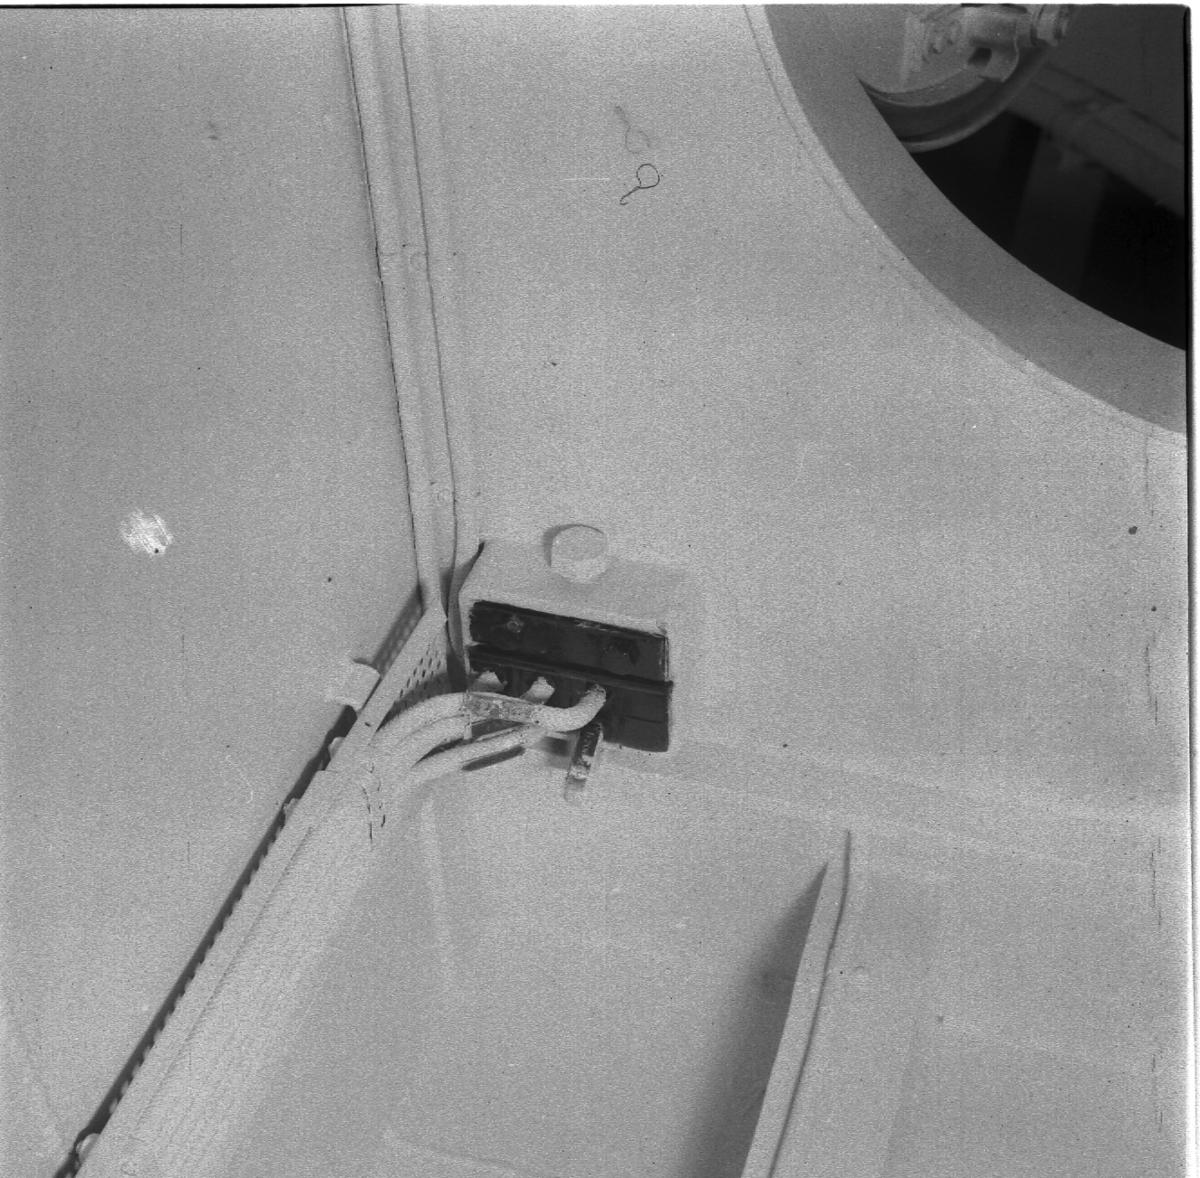 Fartyg: THULE                           Övrigt: Isbrytaren Thules elkablar